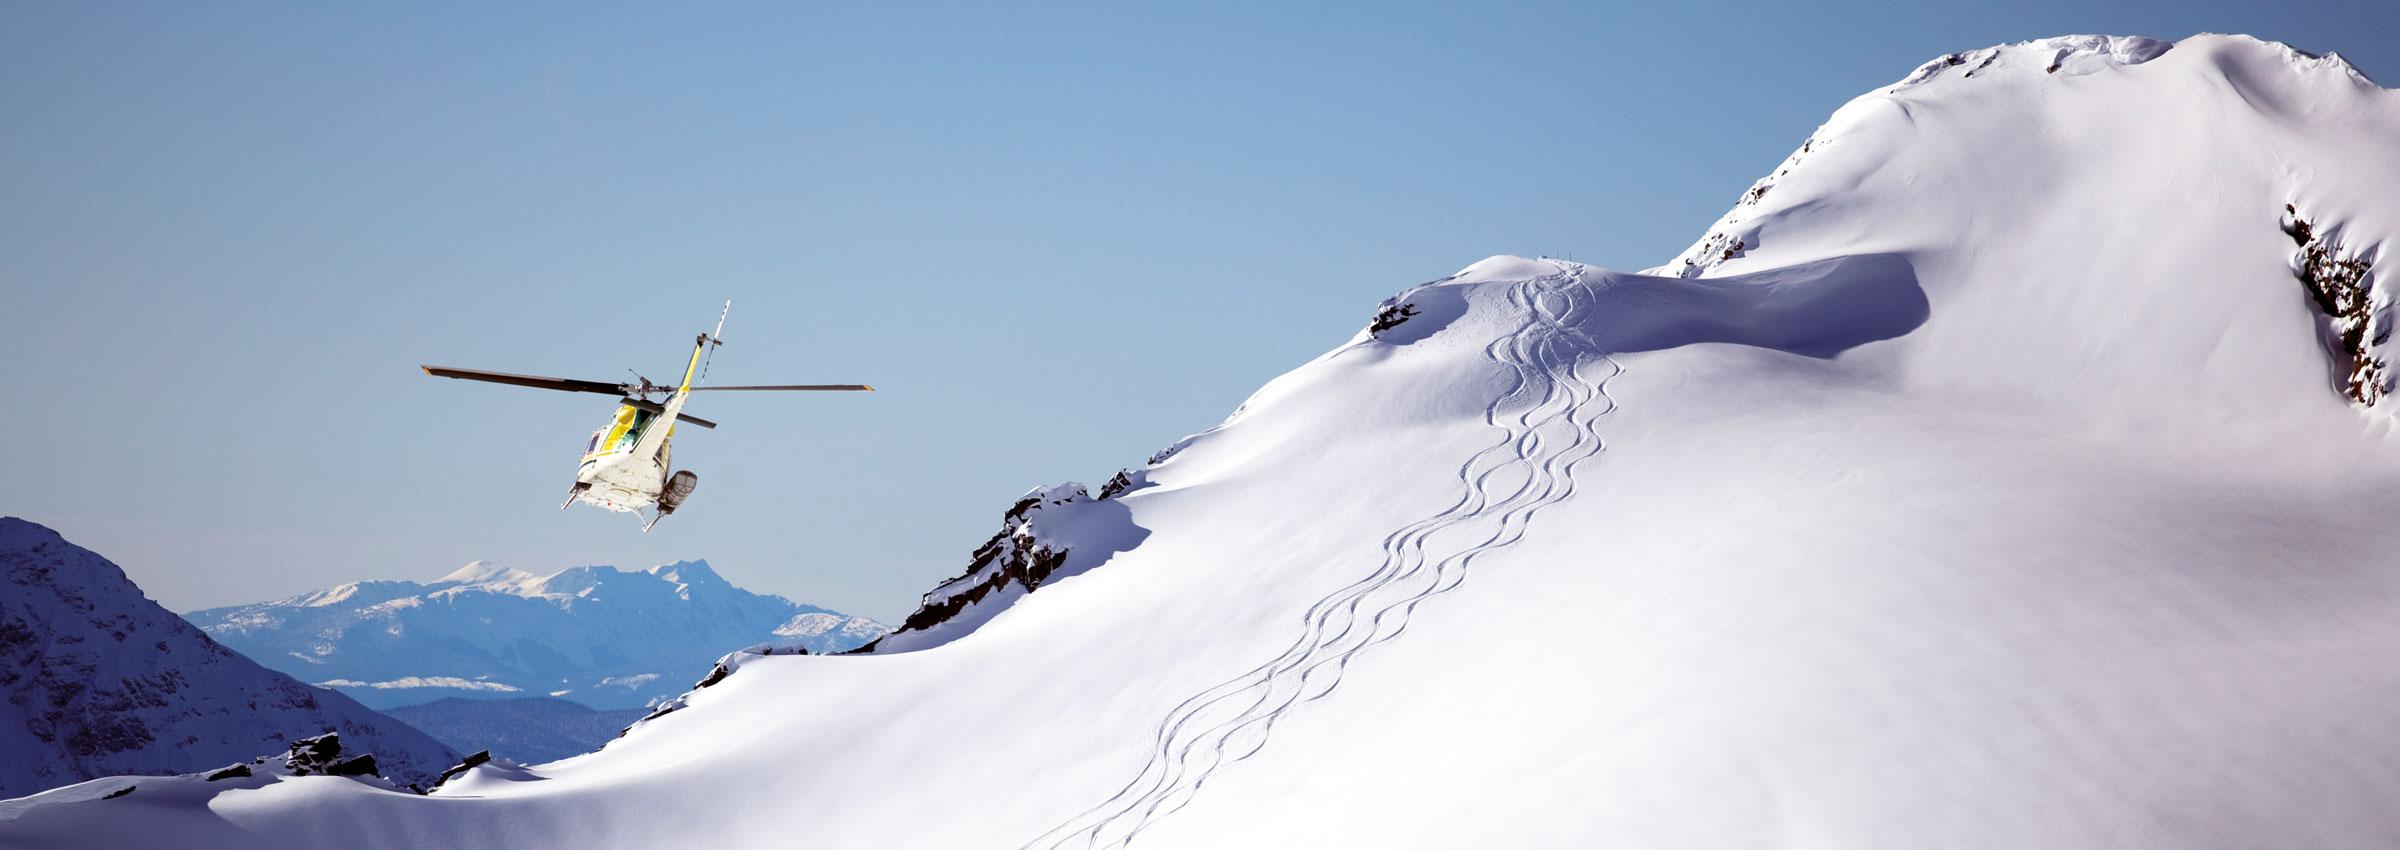 Heli-Skiing Kanada